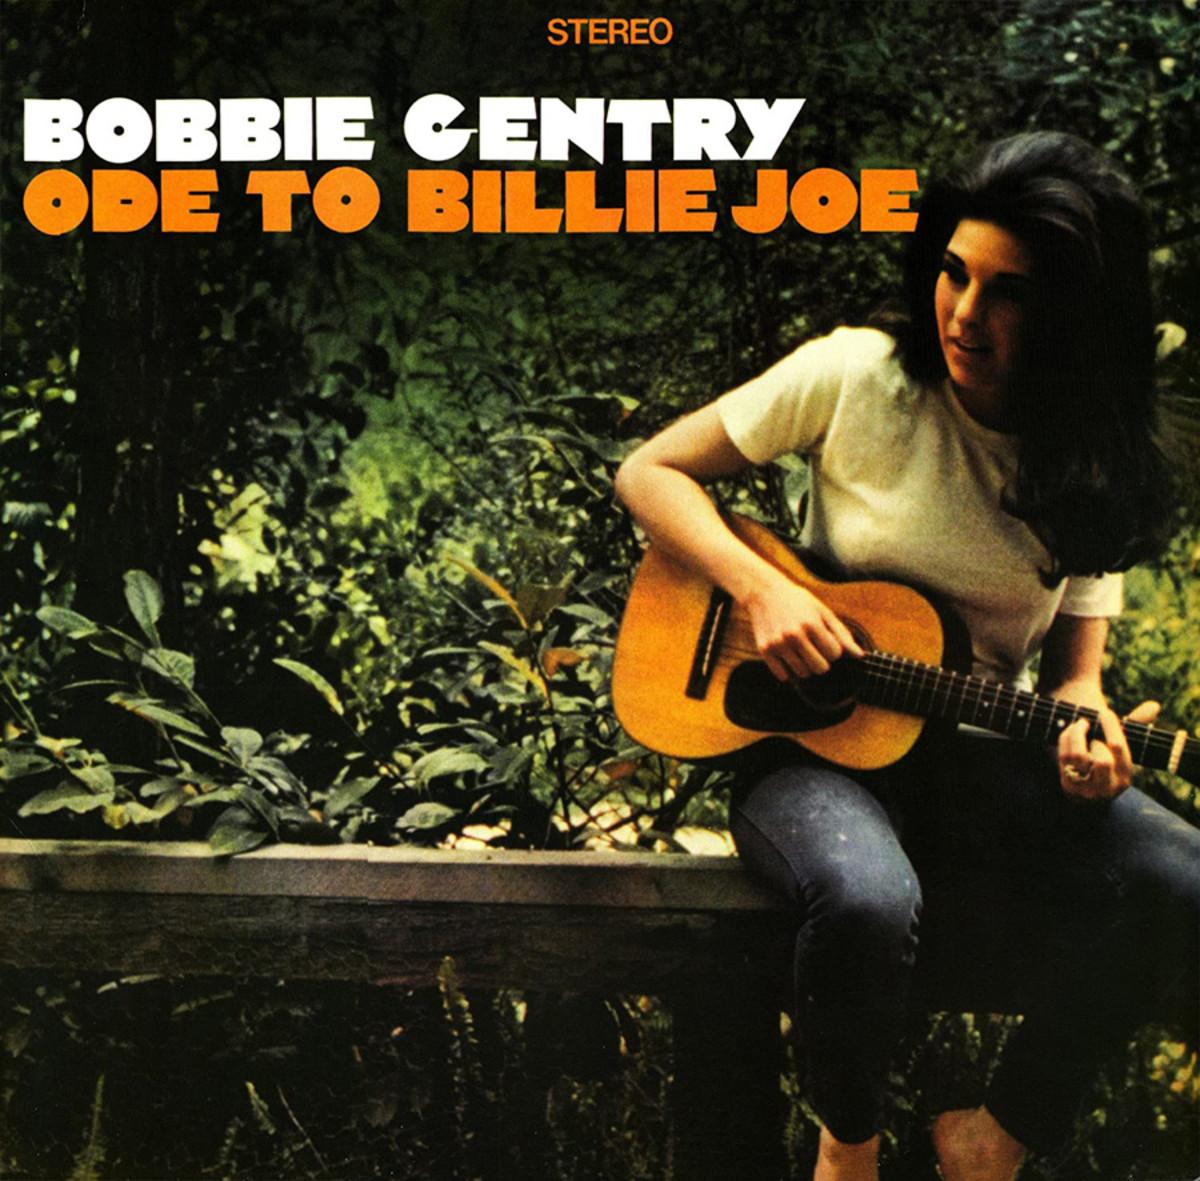 Bobbie Gentry Ode to Billie Joe